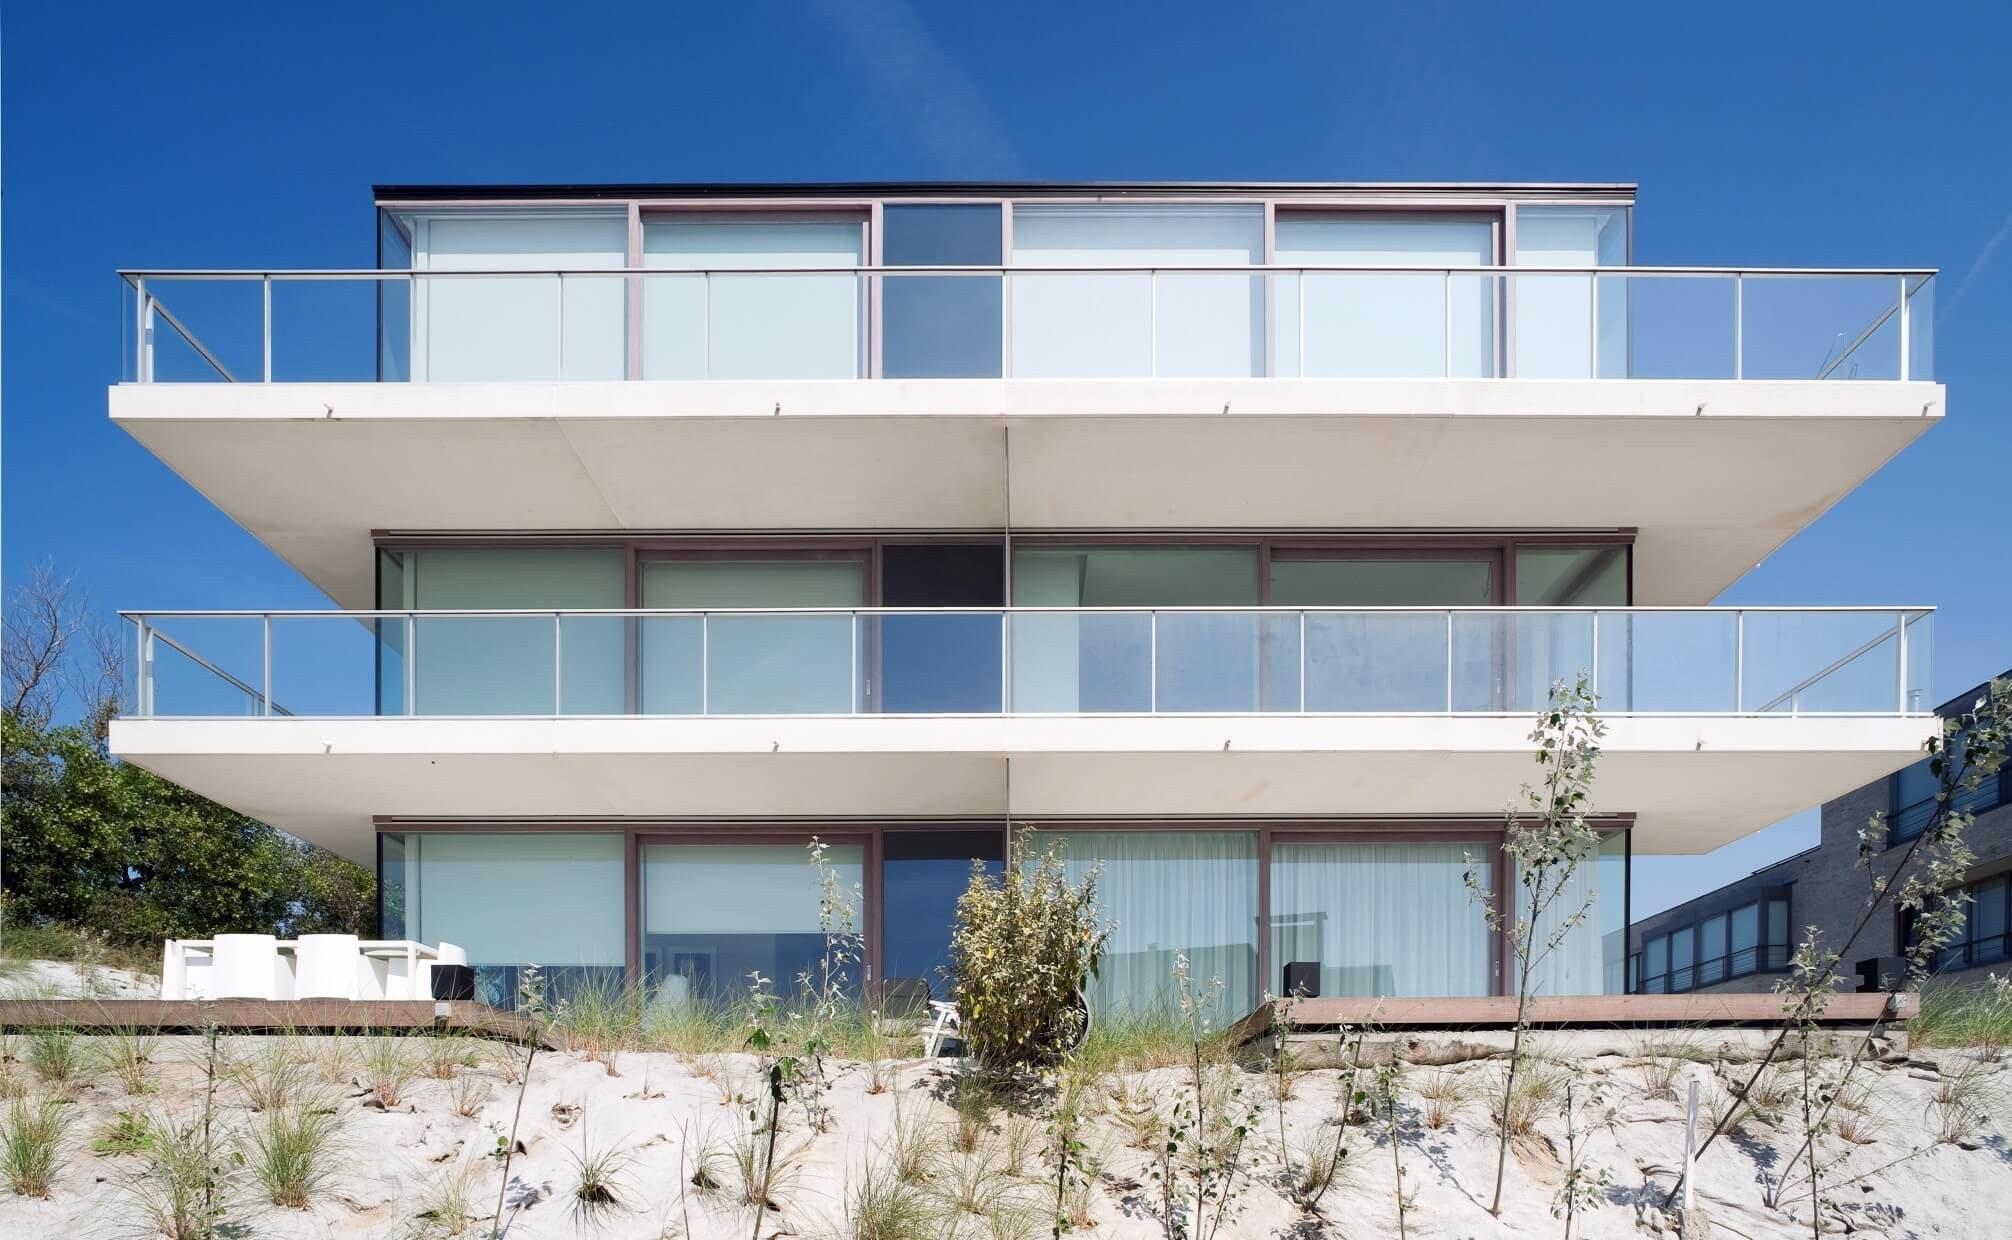 Rietveldprojects-Periscoop-appartement-design-architectuur-kust15.jpg